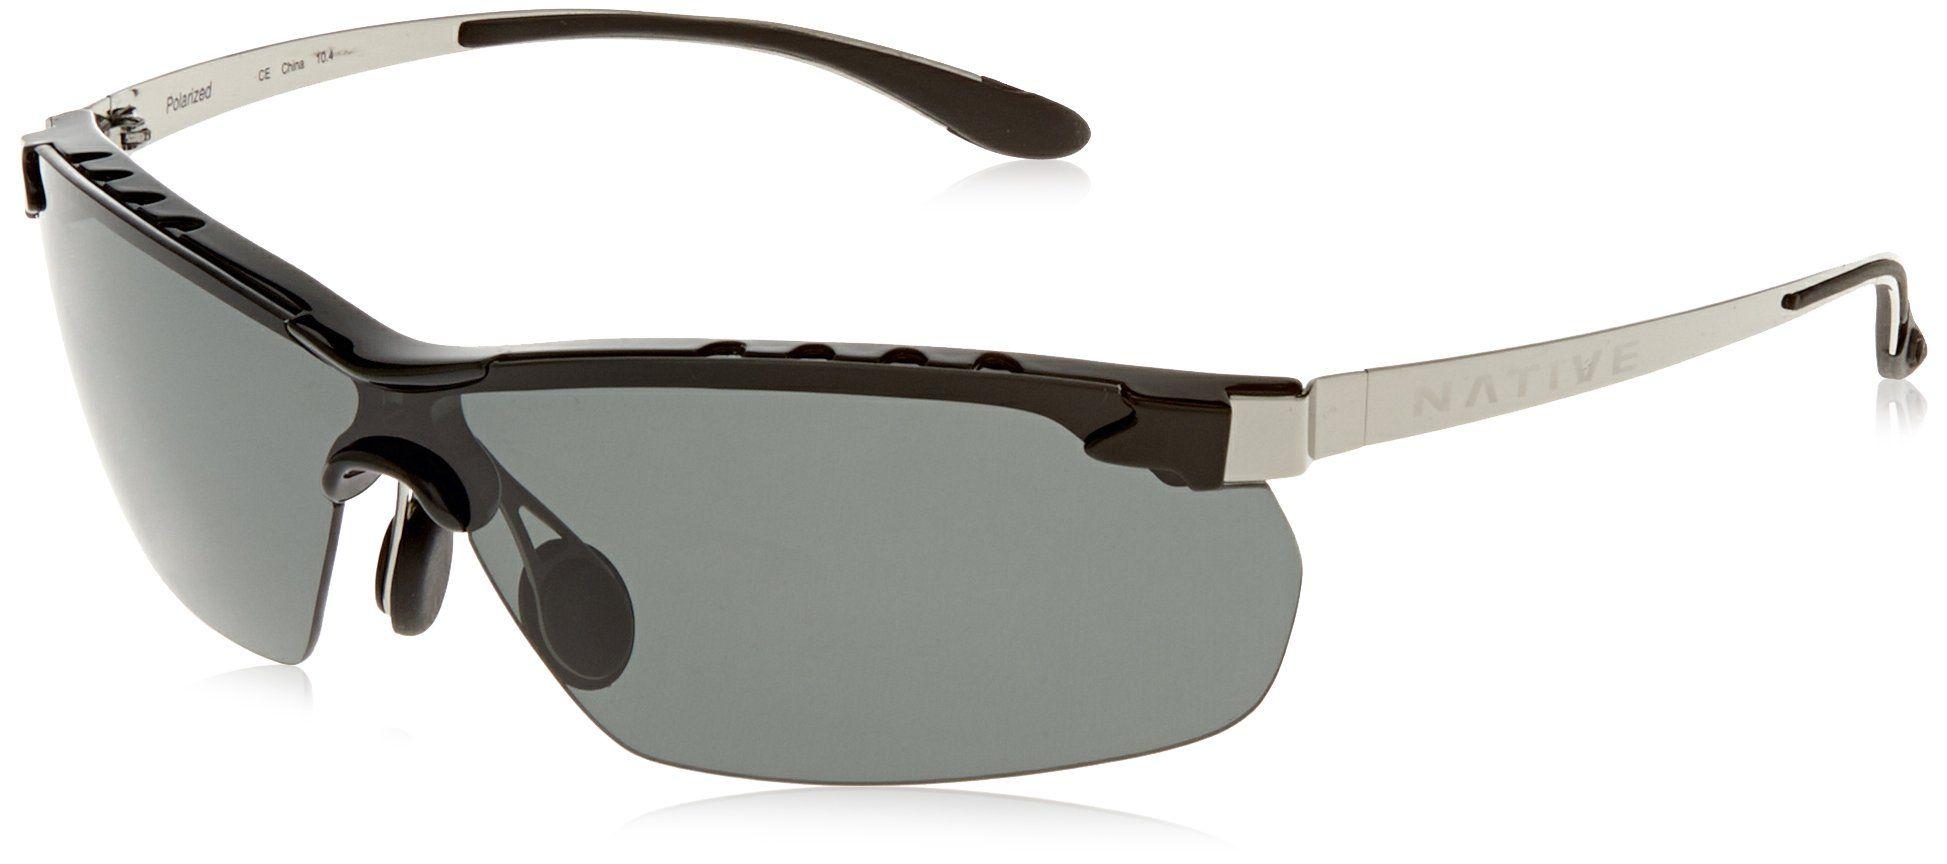 9bba5b38a8 Native Eyewear Frisco Sun Glasses (Silver Reflex/Gray, Chrome/Iron ...